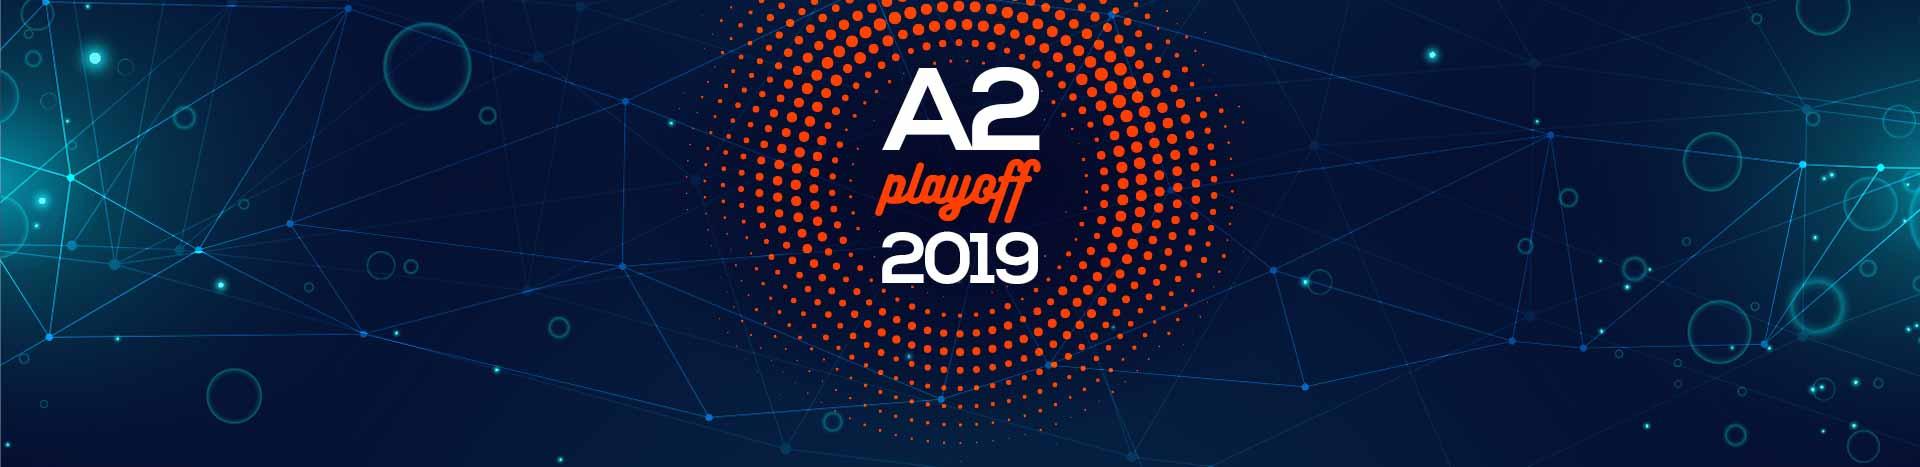 A2 Playoff 2019 – Finale Gara2: Treviso batte ancora Capo d'Orlando